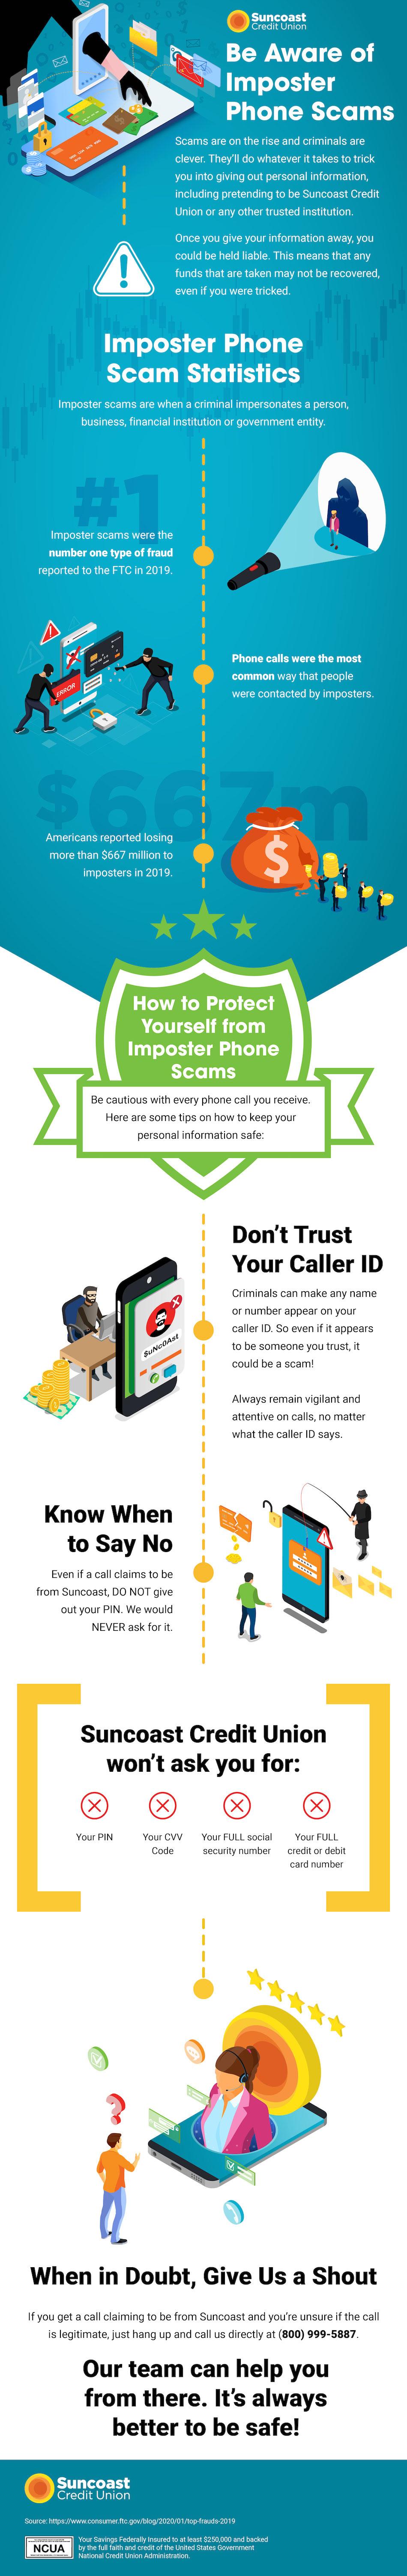 Tenga cuidado con los fraudes de phishing por teléfono